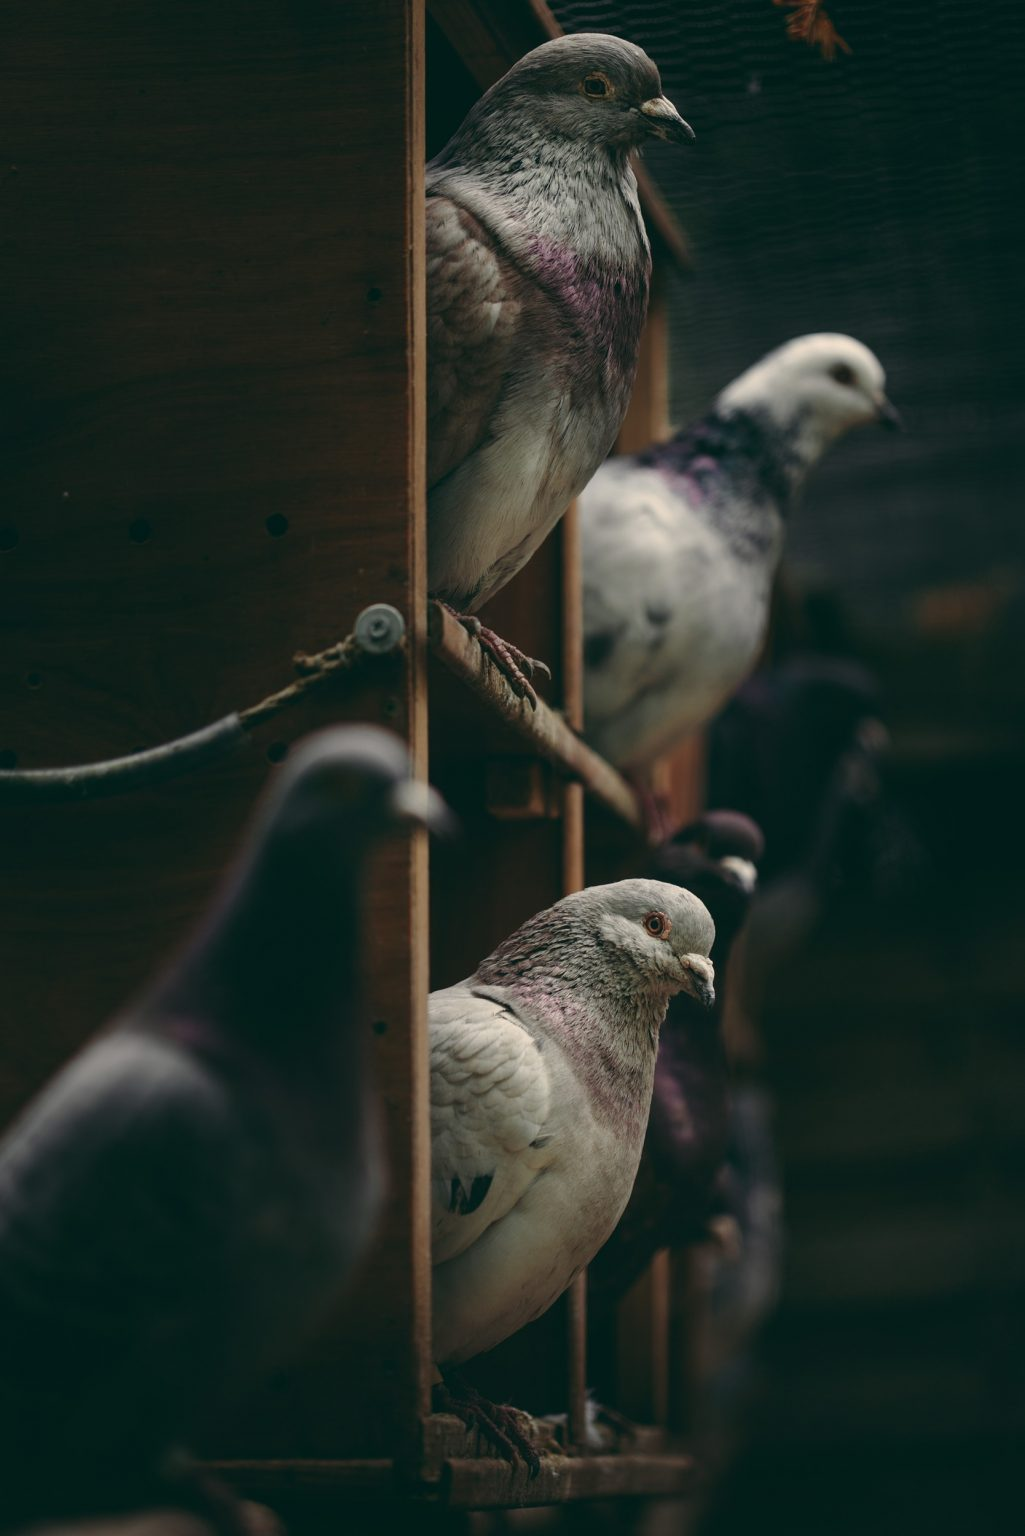 Bonneuil-Matours, France, May 2017 - La Maison Neuve, The pigeons live all together in a large aviary. There is, among them, a strong group hierarchy, although some dominant relationships vary over time as well as the sexual orientations of individuals. ><  Bonneuil-Matours, Francia, maggio 2017 - I piccioni vivono tutti insieme in una grande voliera. Tra di loro c'è una forte gerarchia di gruppo, anche se alcune relazioni dominanti variano nel tempo così come gli orientamenti sessuali degli individui.*** SPECIAL   FEE   APPLIES *** *** Local Caption *** 01489357